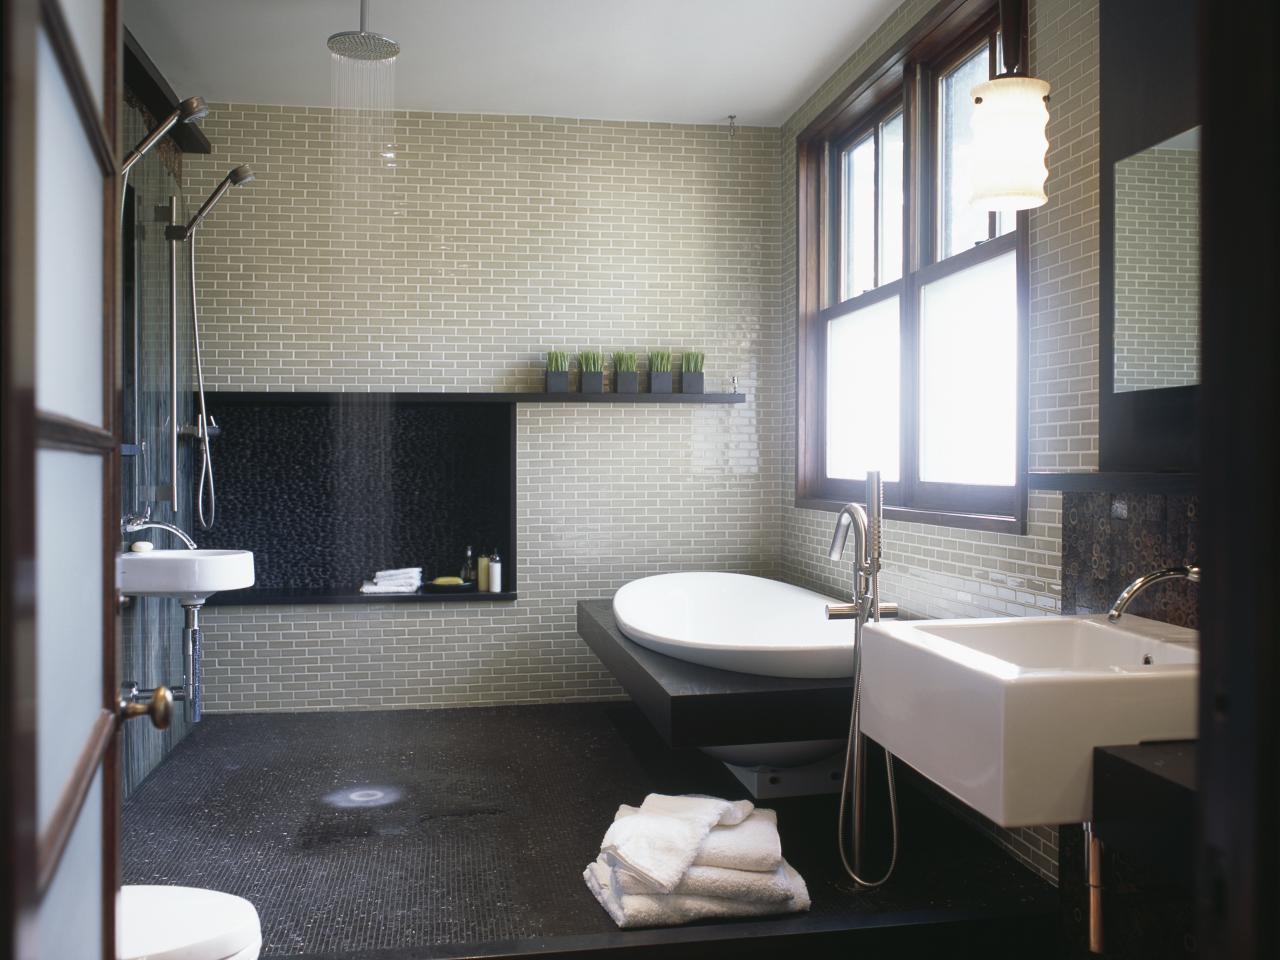 De-stress Yourself With A Spa Like Designed Bathroom